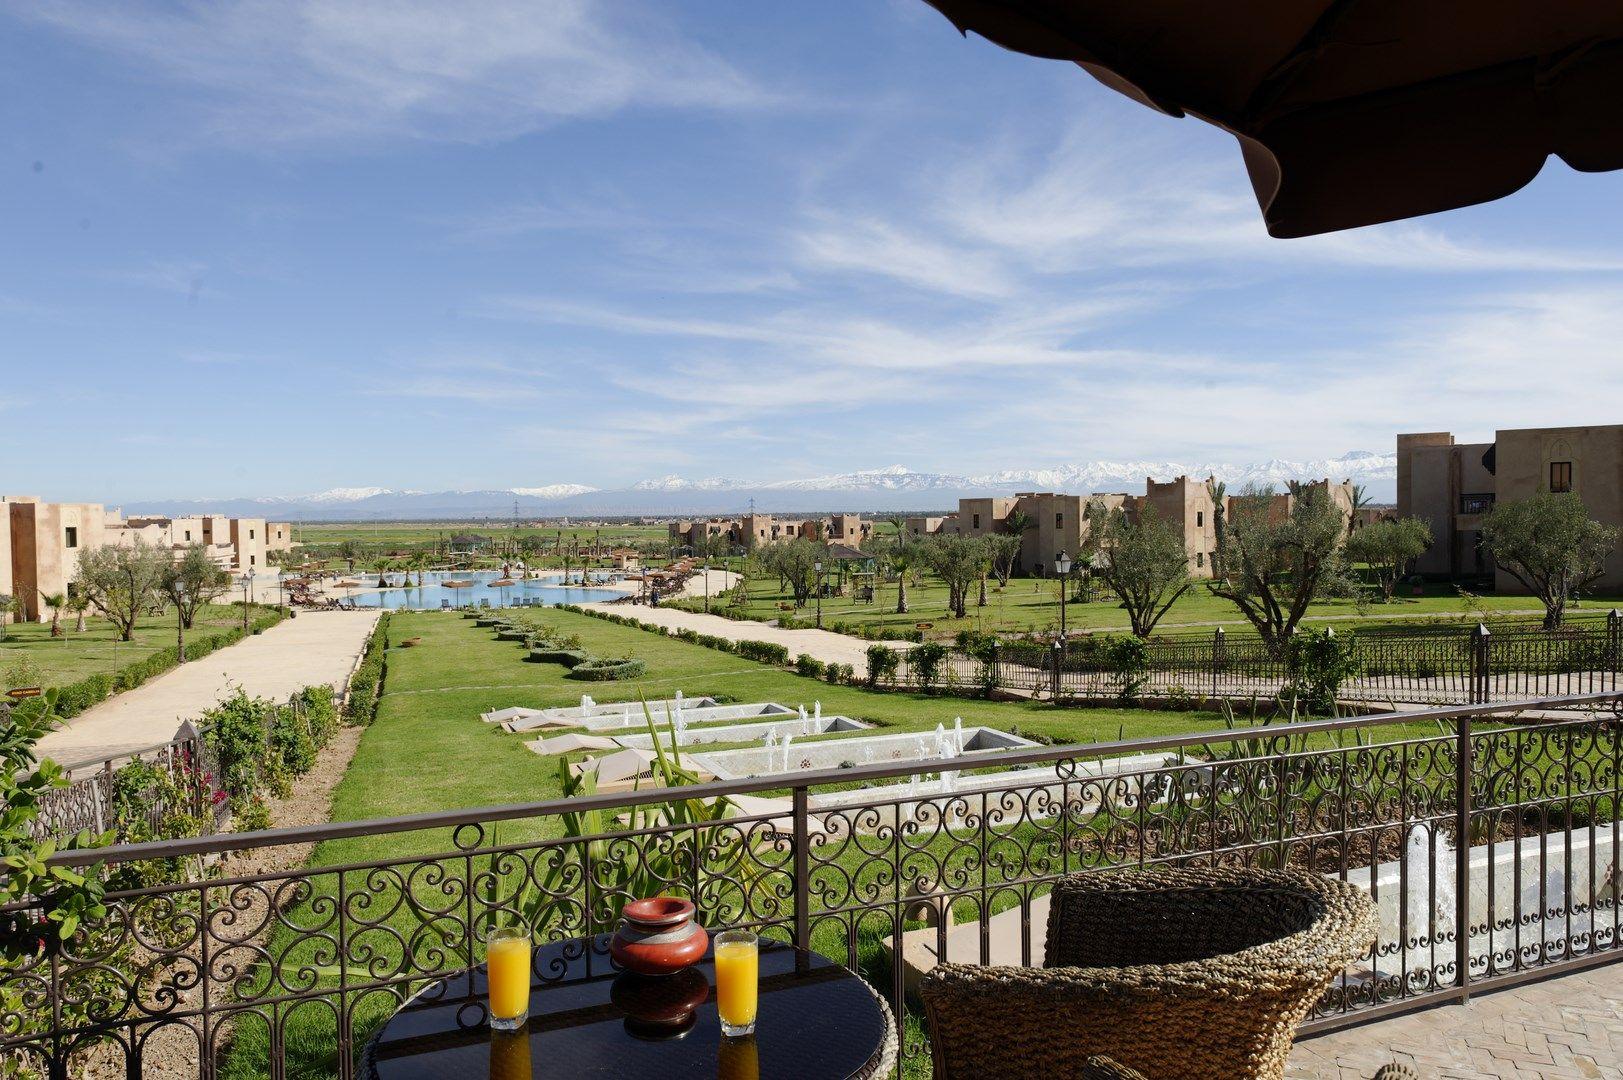 Maroc - Marrakech - Hôtel Blue Sea Marrakech Ryads Parc and Spa 4*